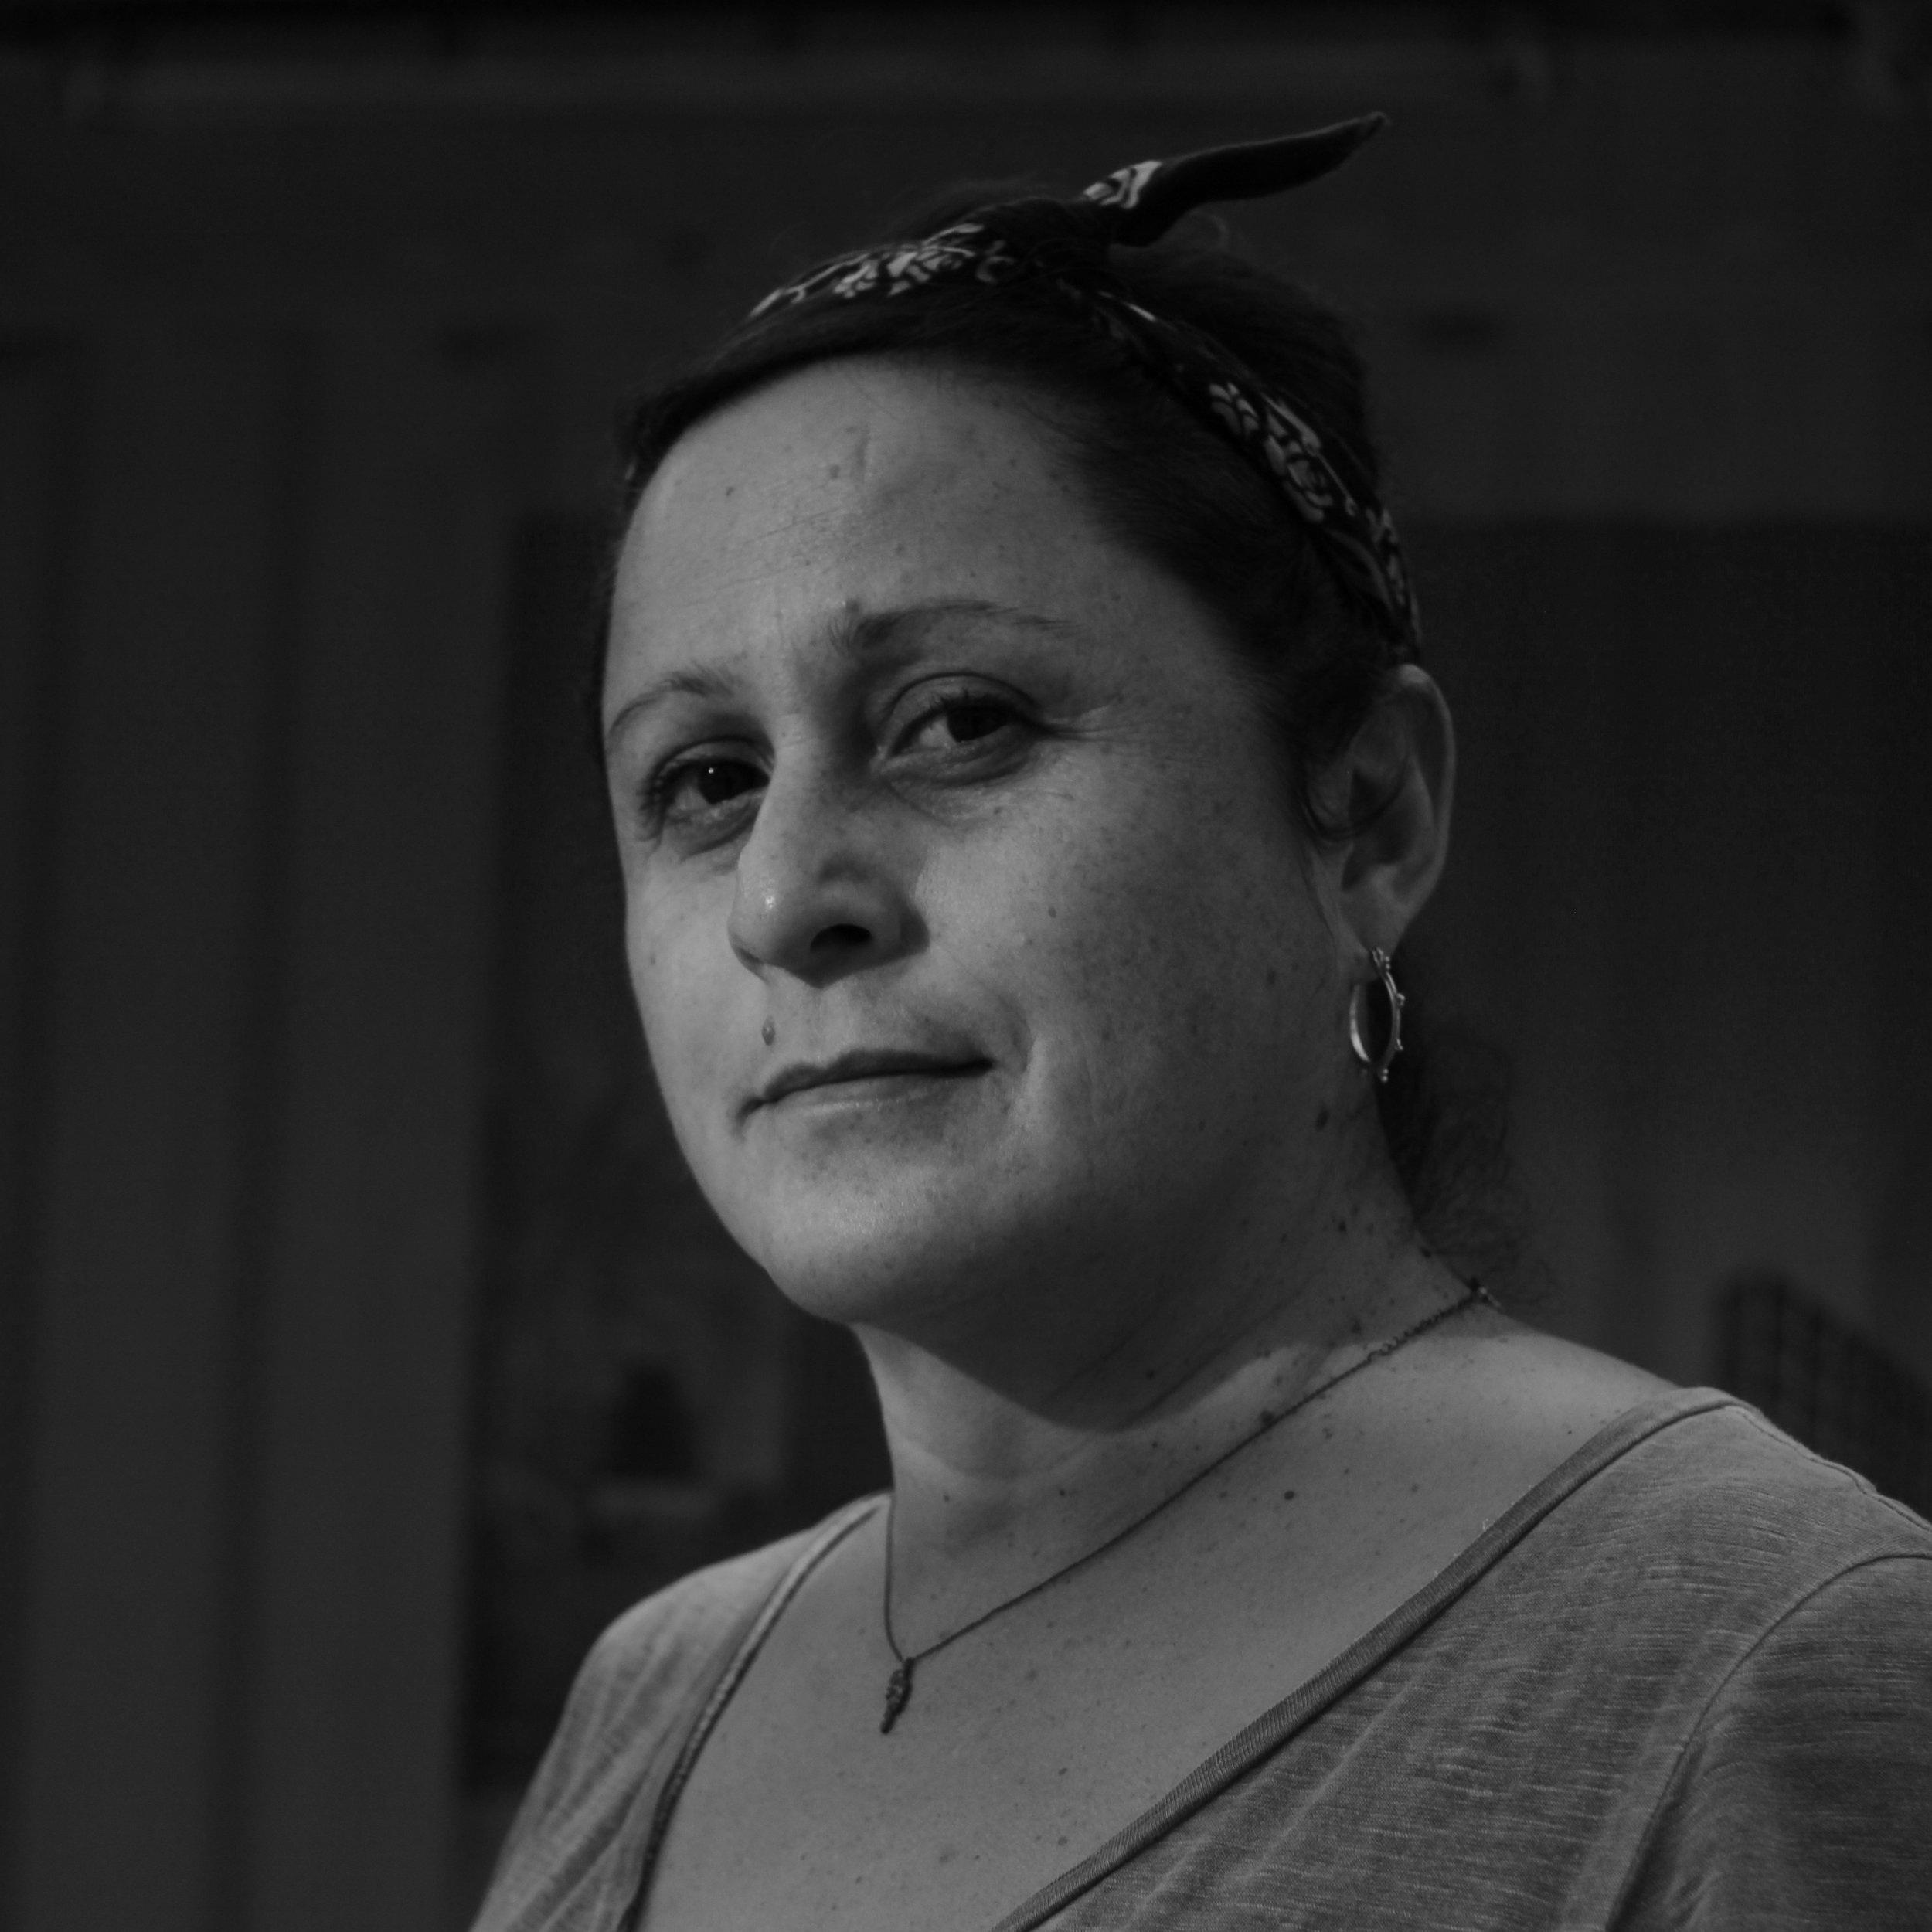 Mary Qunisacara -